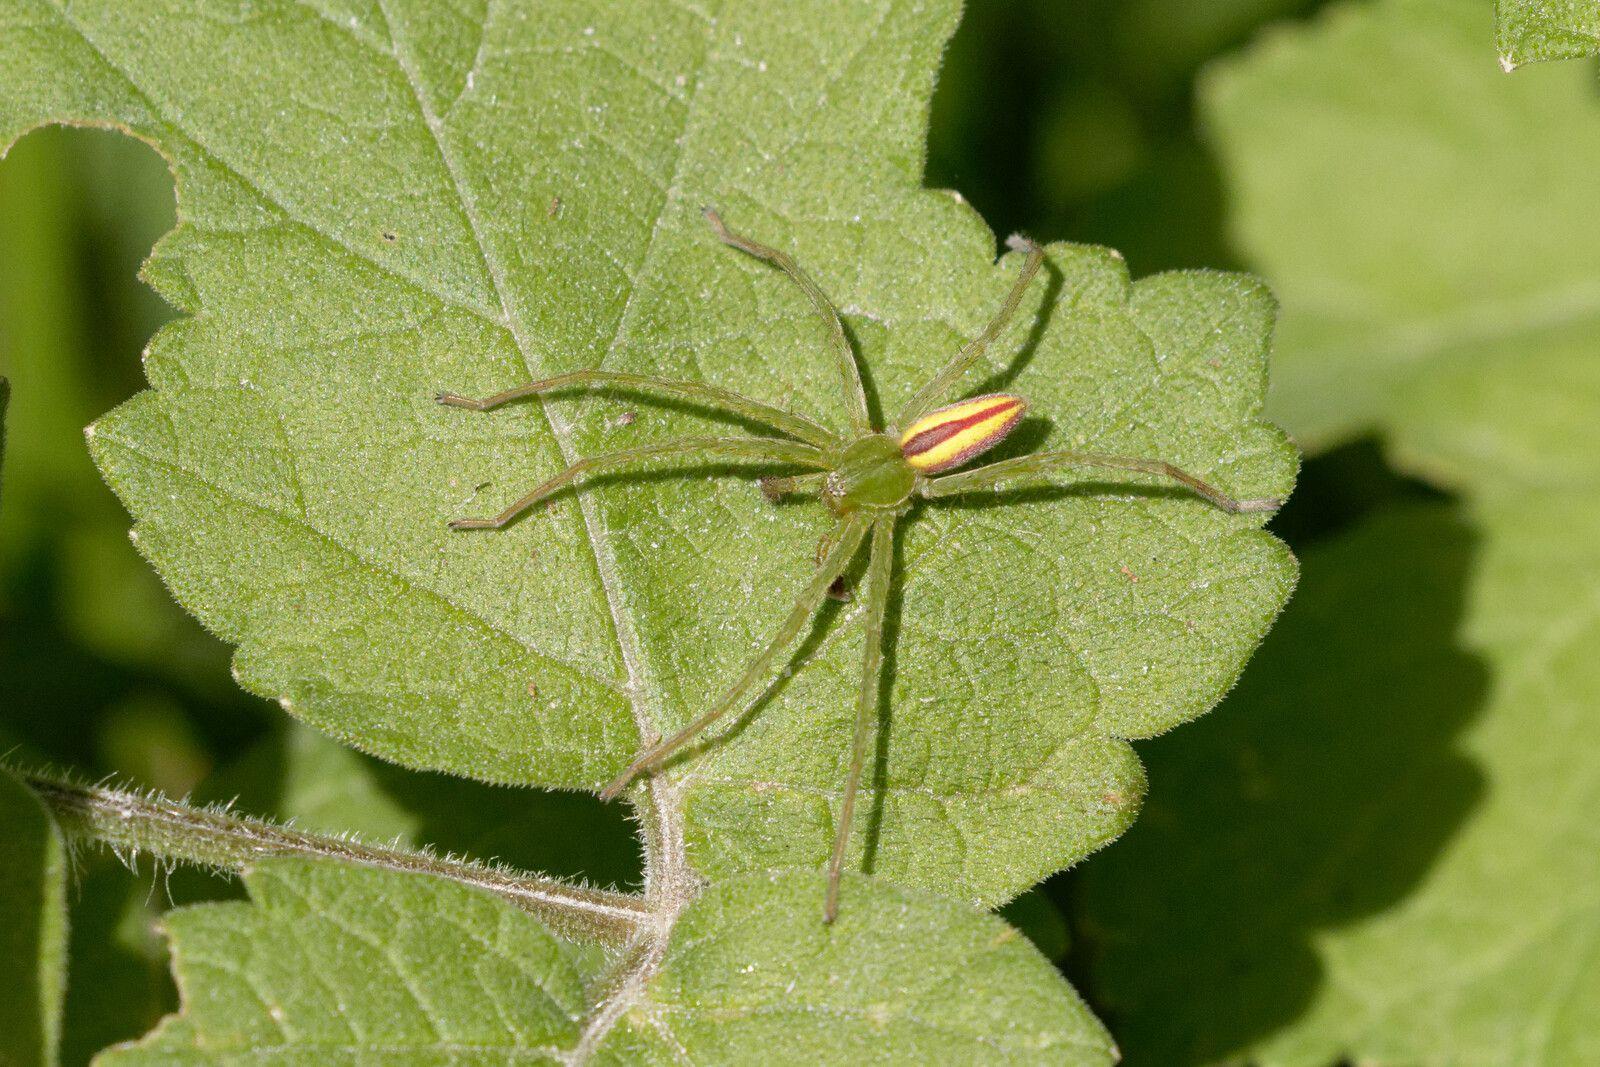 Micrommate émeraude (Micrommata virescens)